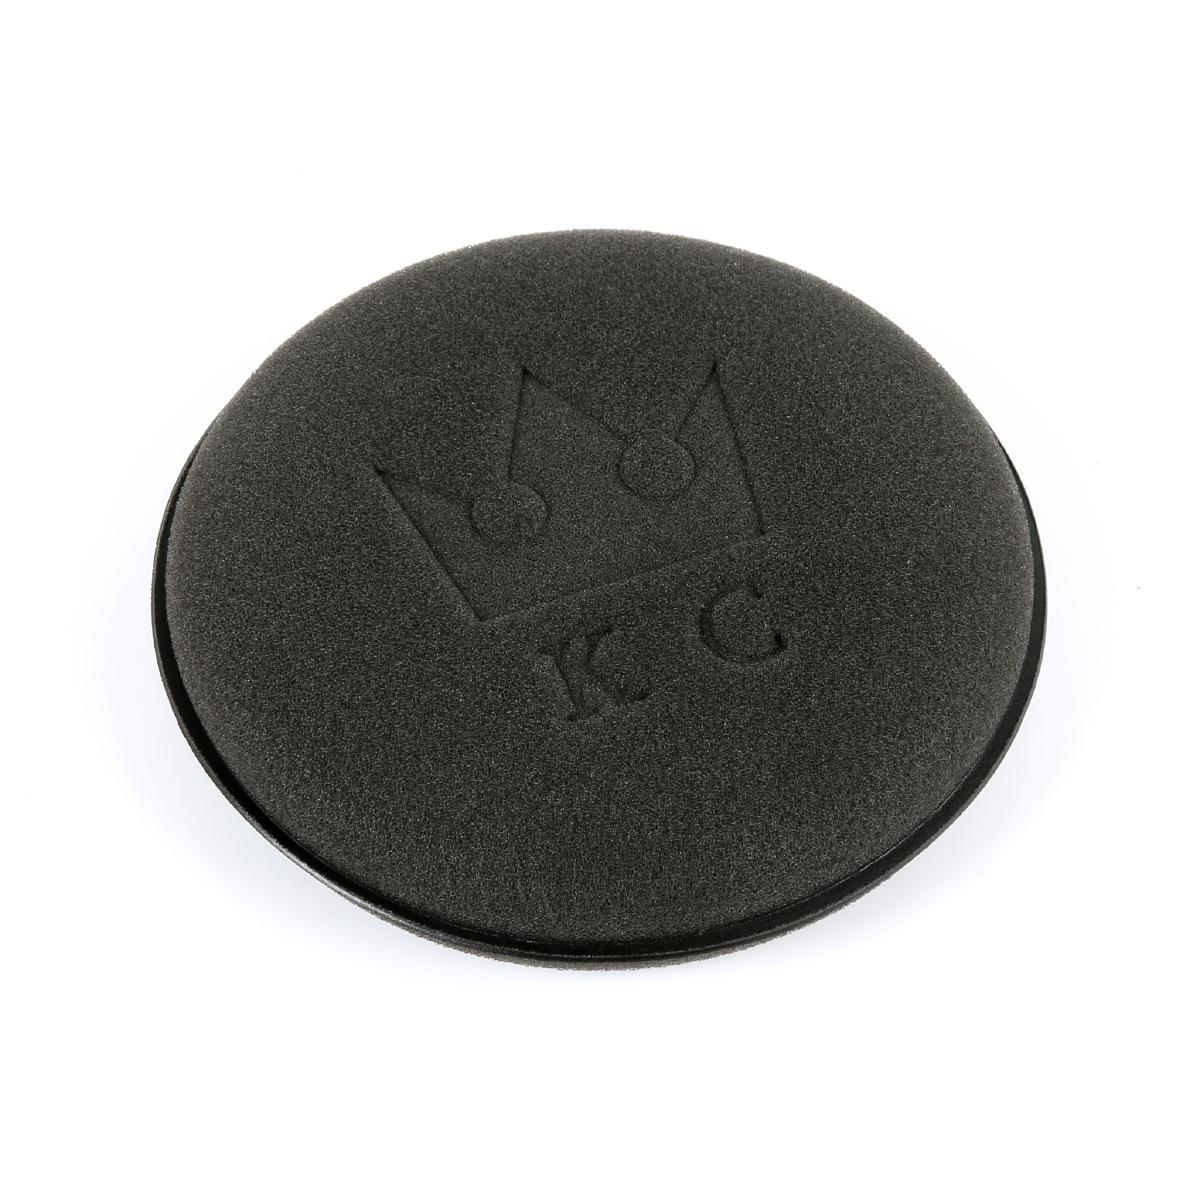 Vaxapplikator King Carthur Round Wax Applicator, 4st